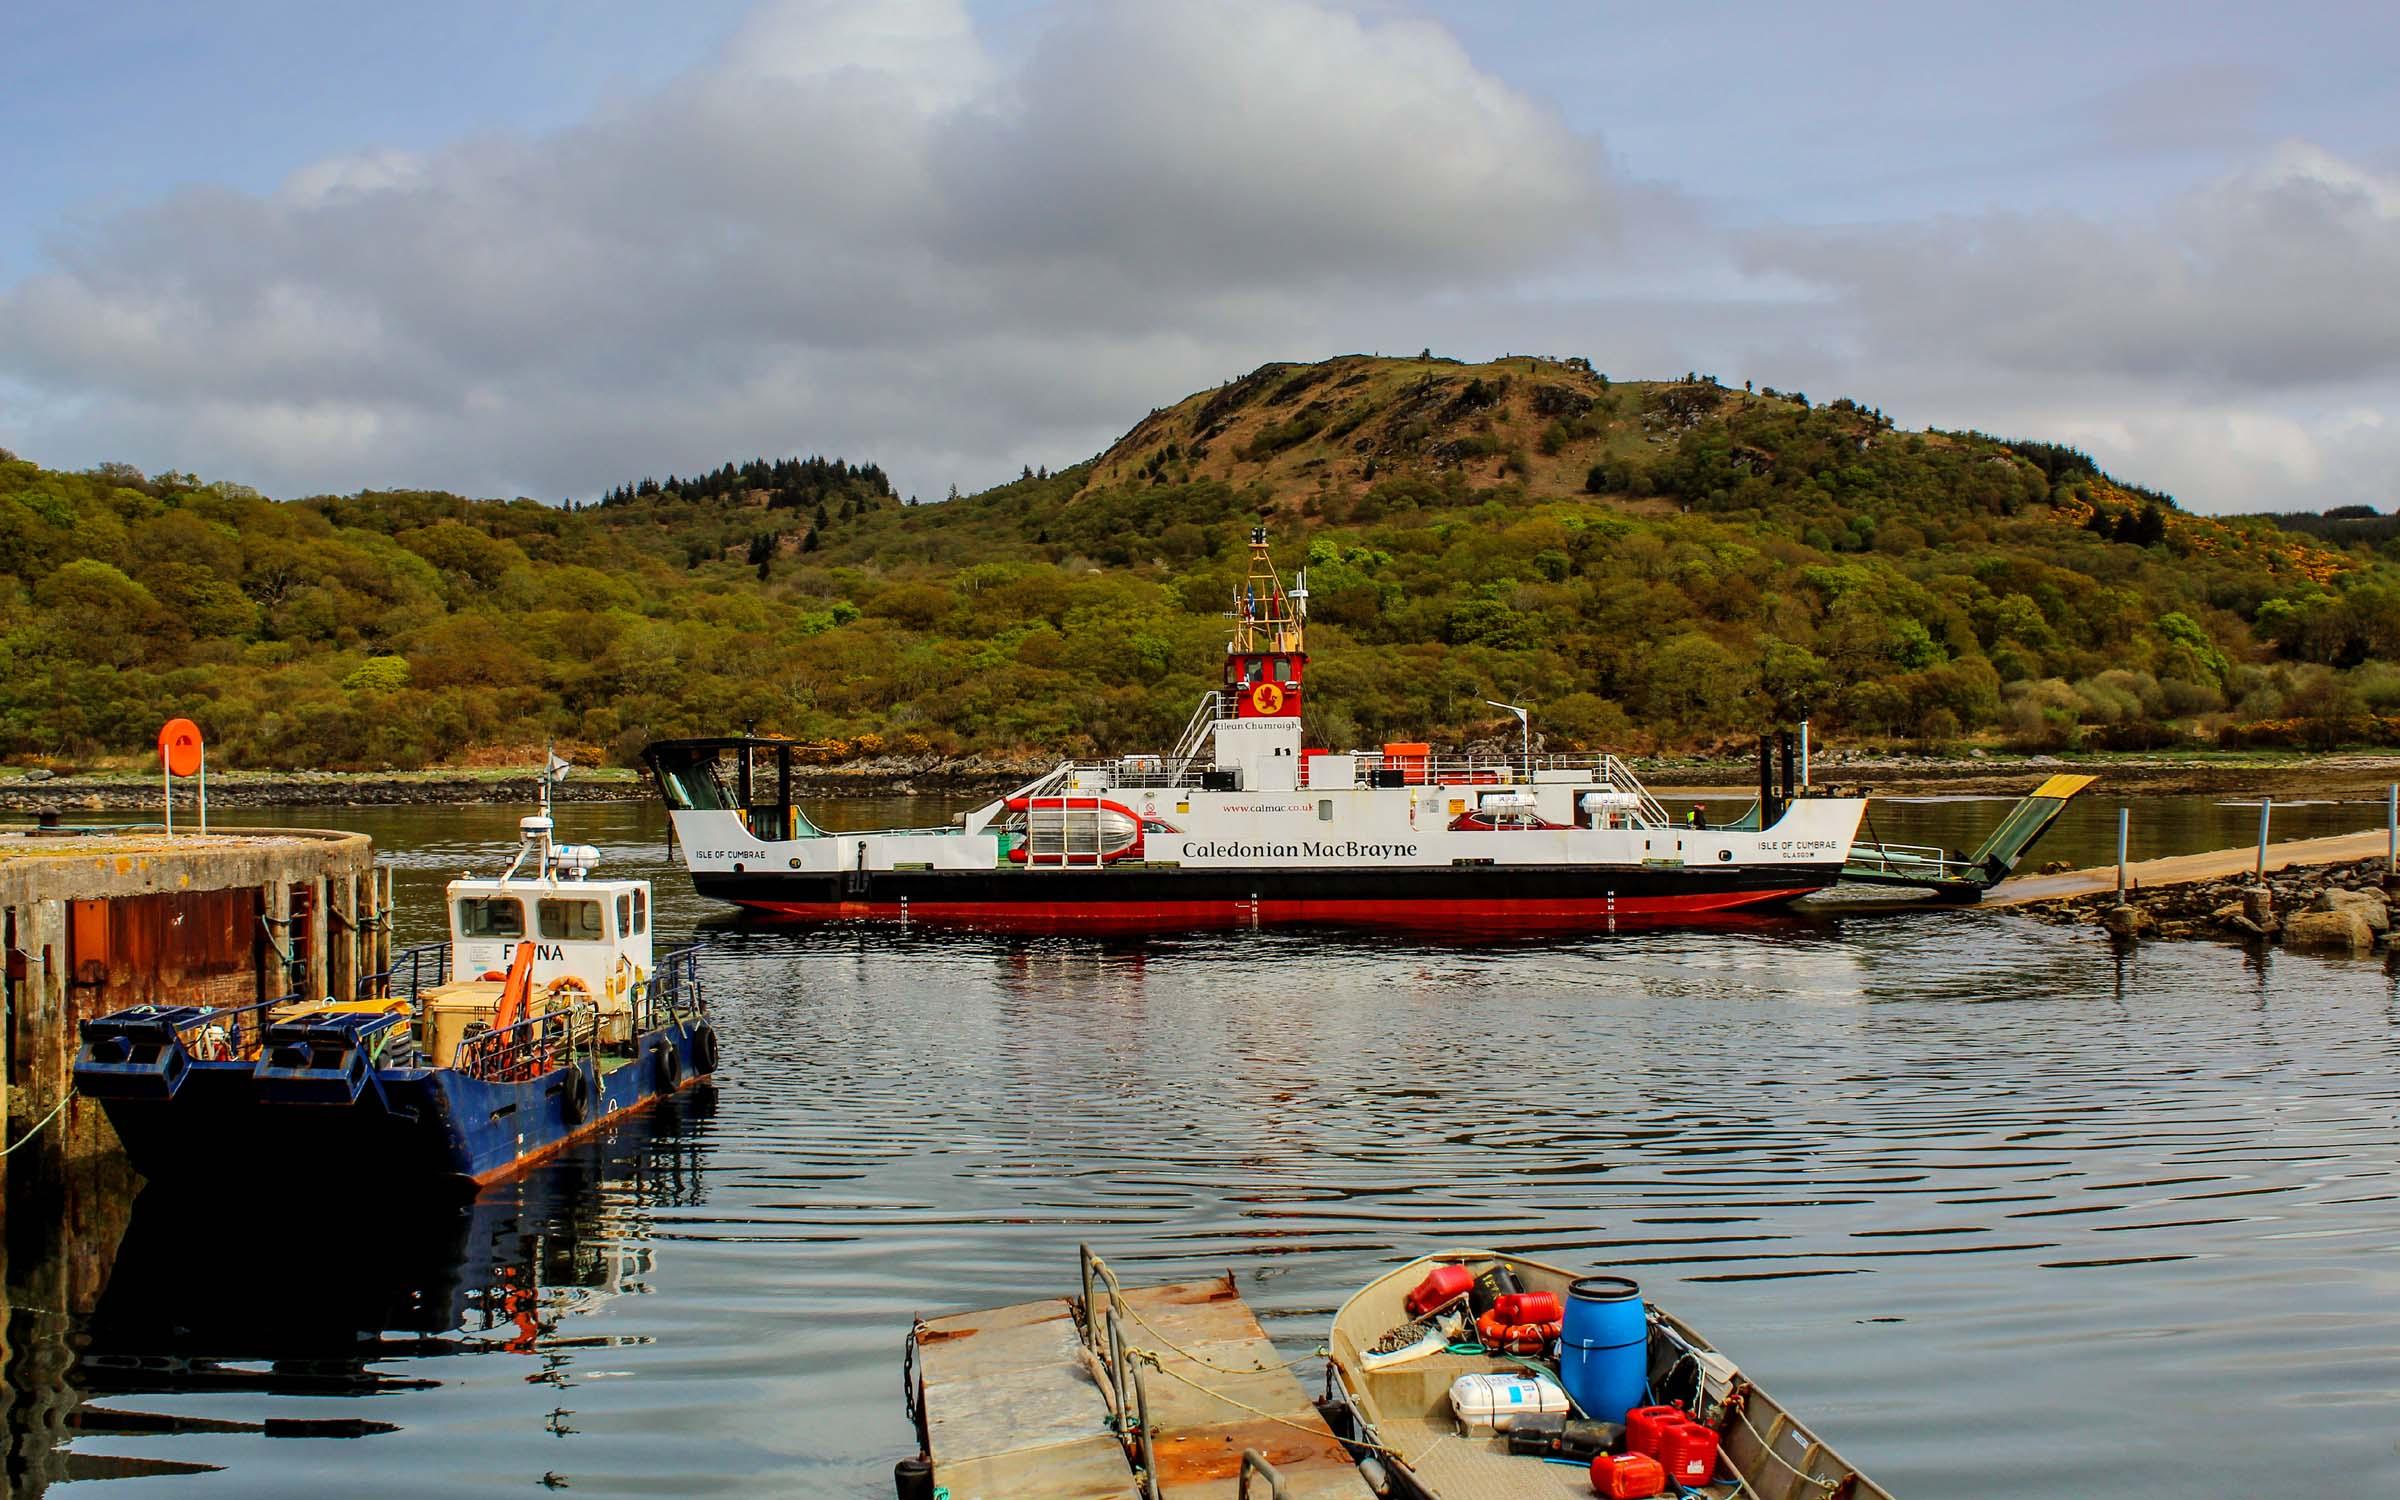 Isle of Cumbrae back in service at Portavadie (Ships of CalMac)